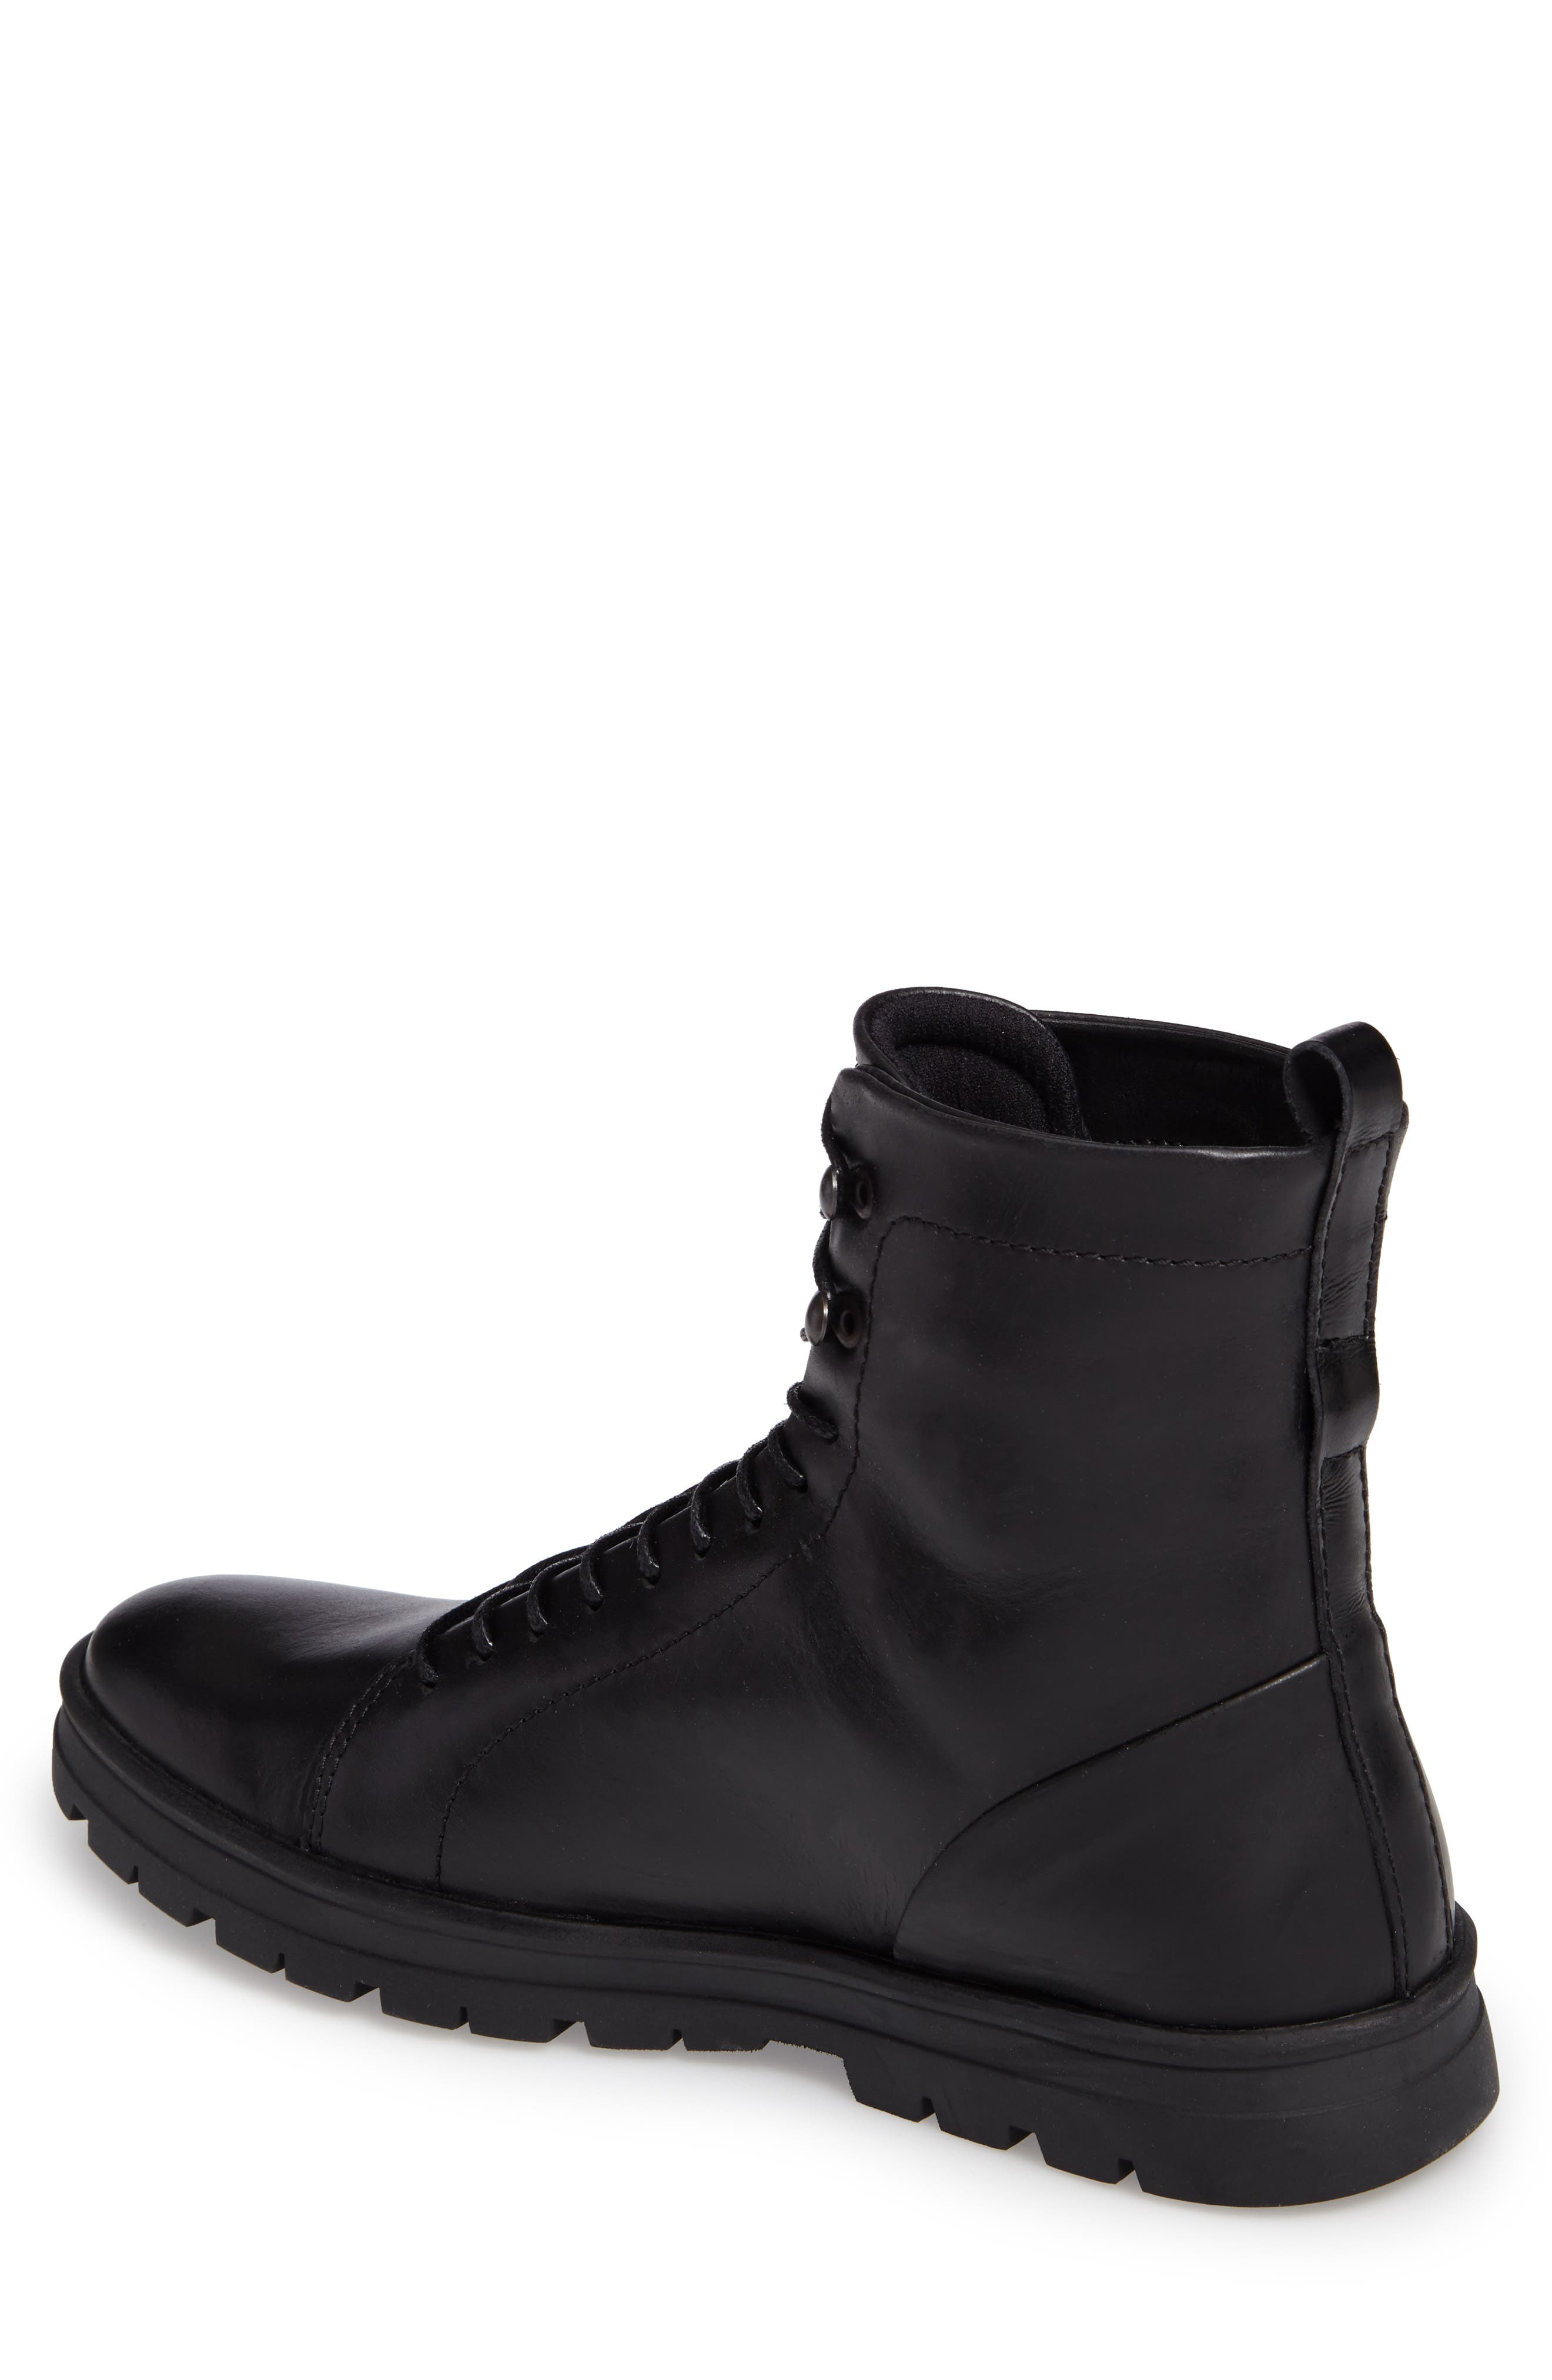 Hudson Waterproof Tall Boot,                             Alternate thumbnail 2, color,                             001